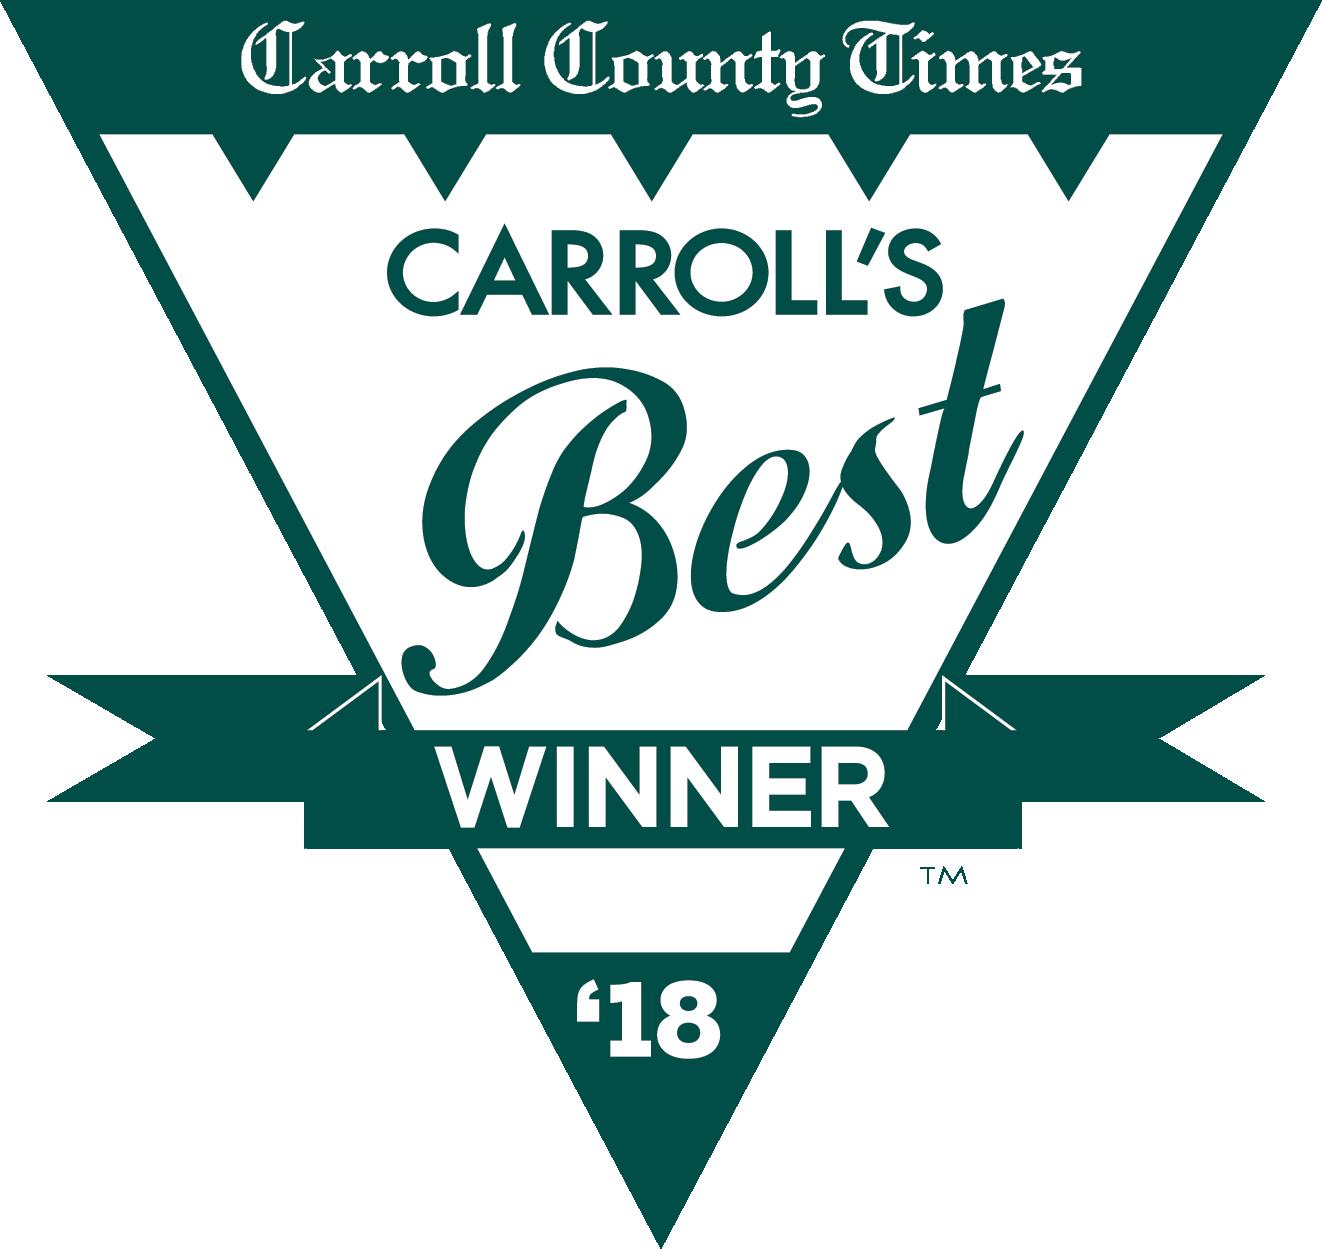 carrolls best winner 2018.png